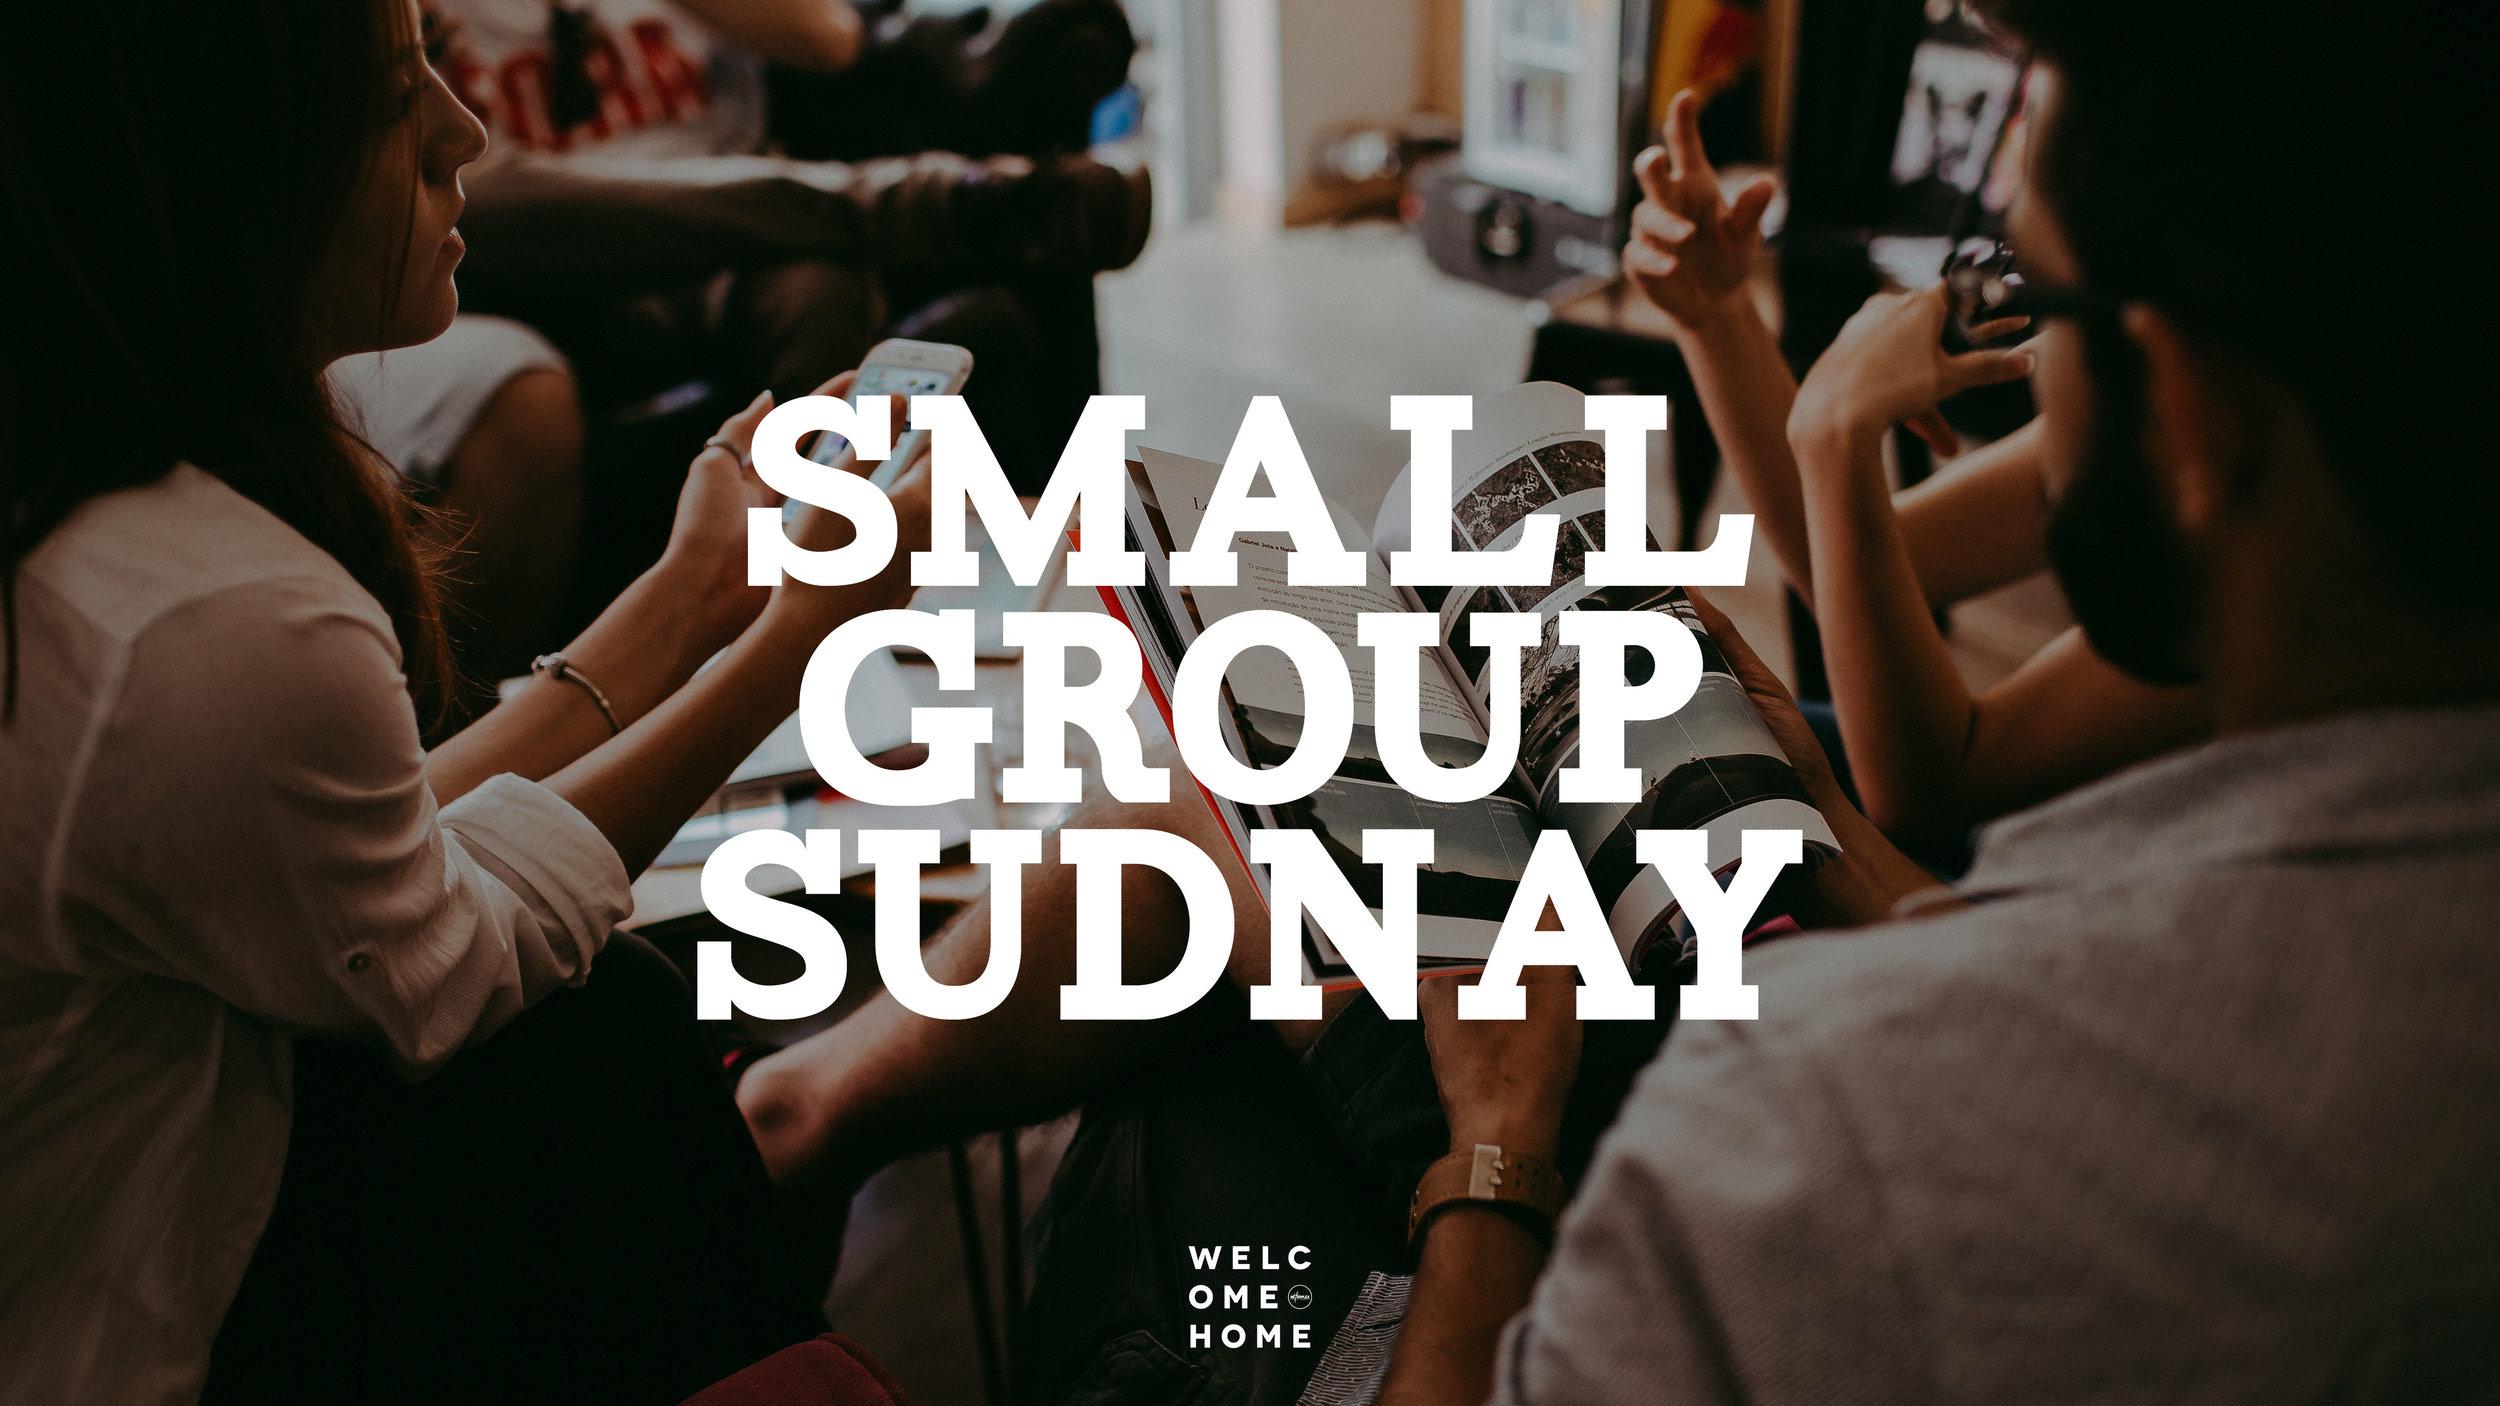 Graphic - Small Group Sunday - Thumbnail.jpg